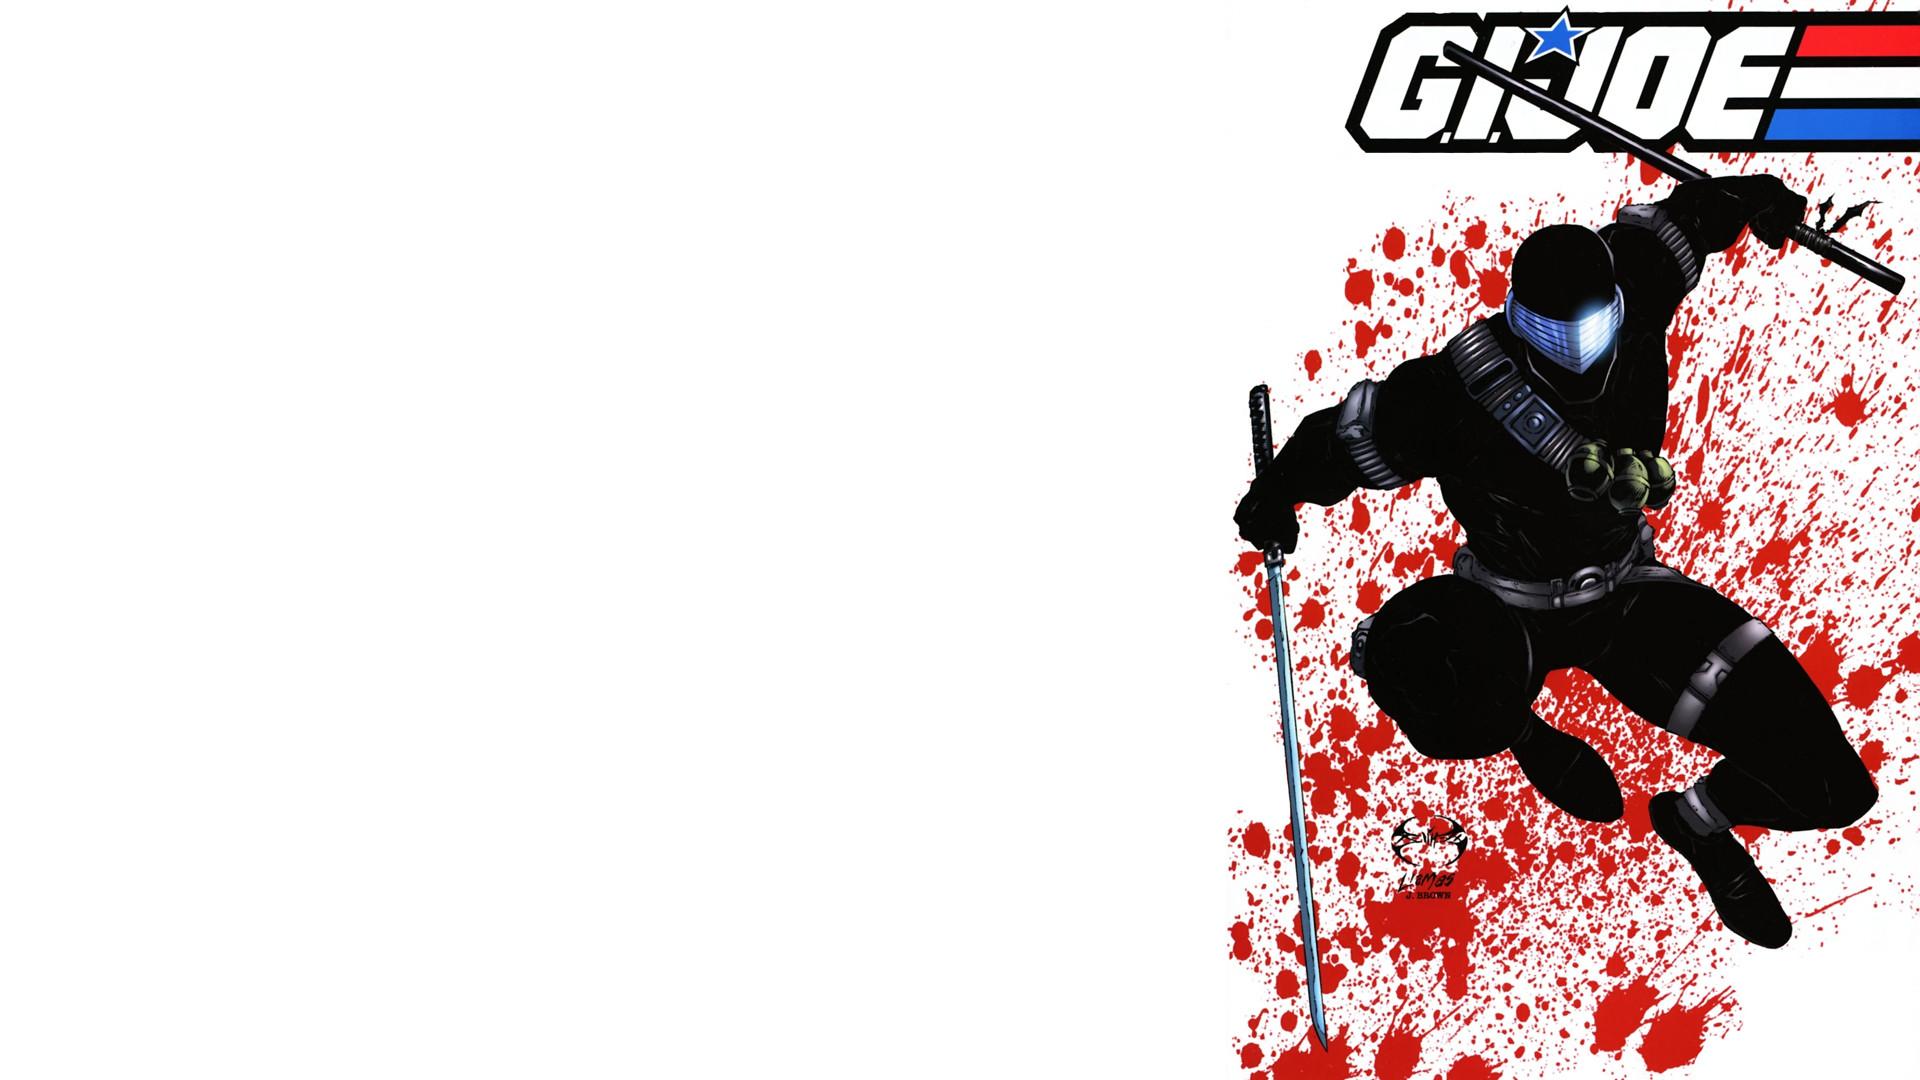 GI Joe Snake Eyes White Blood Sword Katana wallpaper | | 78744 |  WallpaperUP